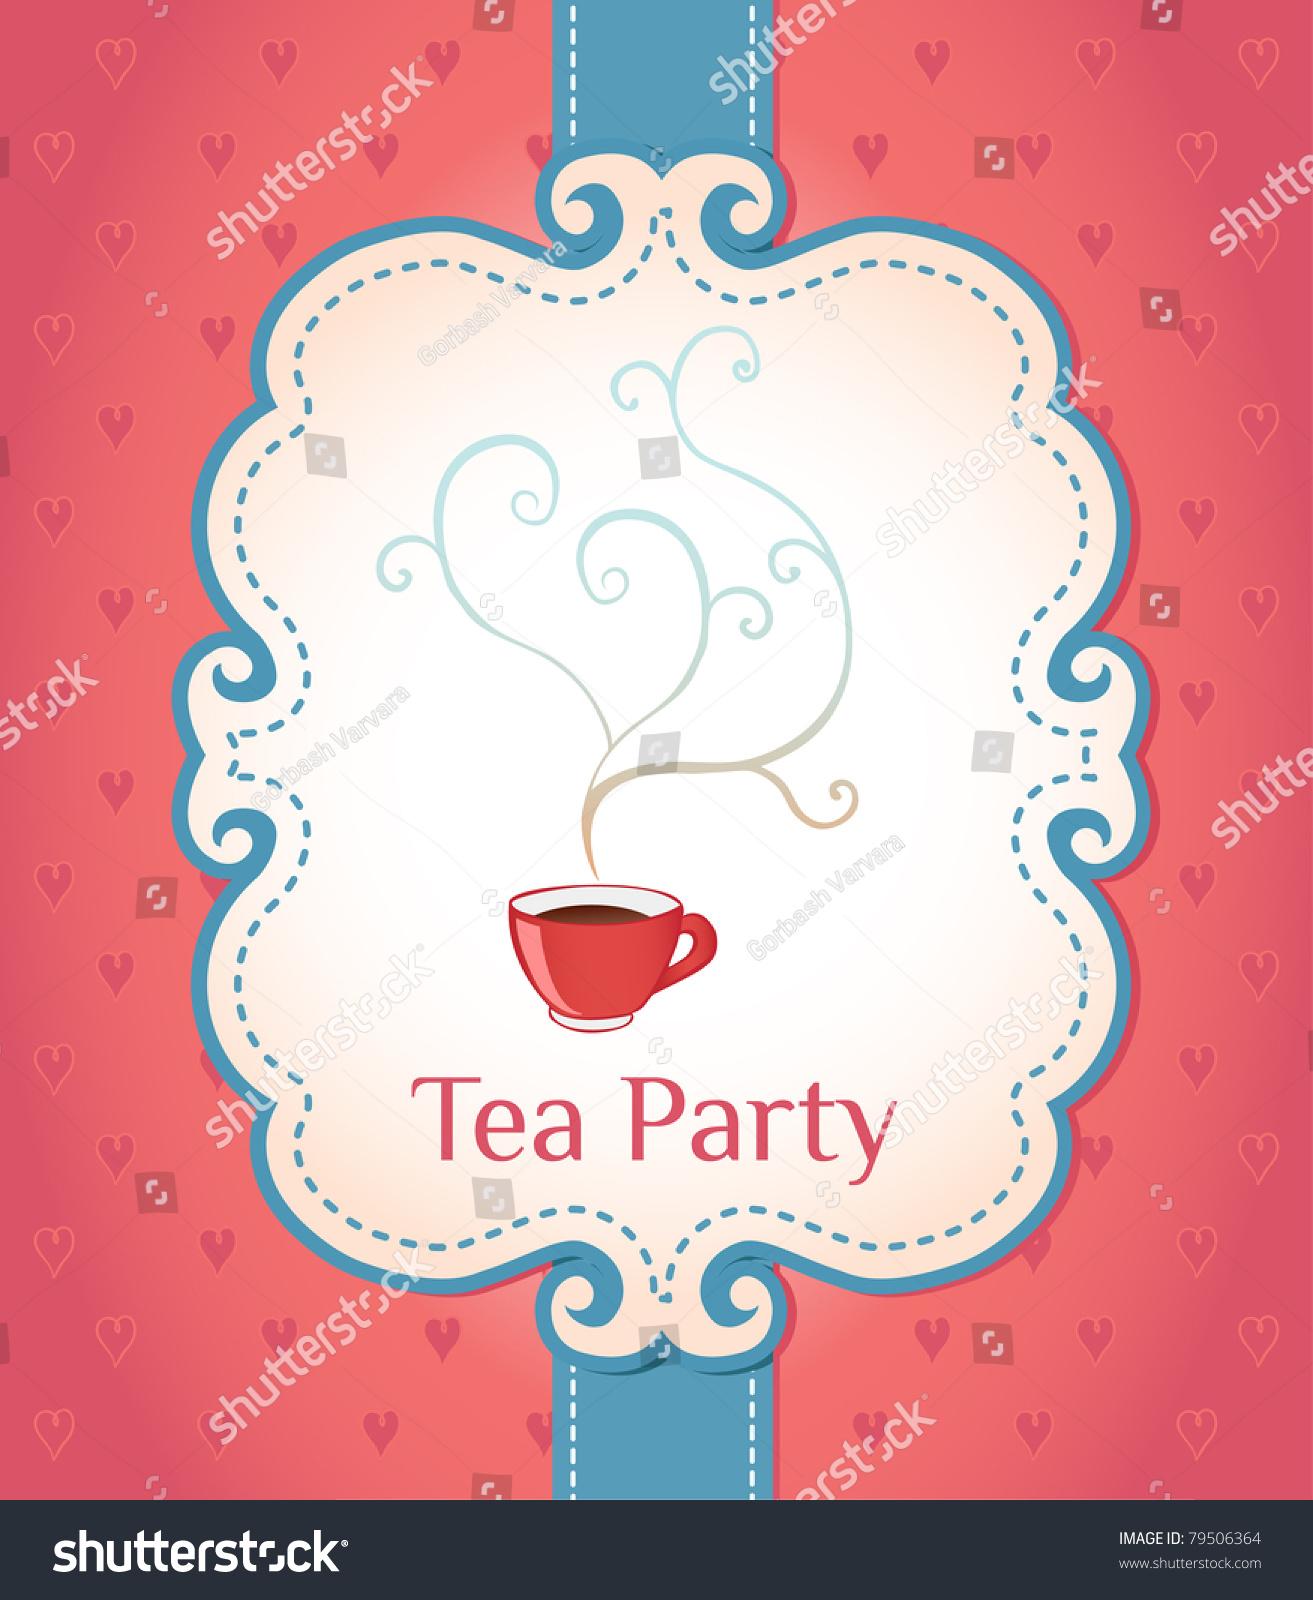 clipart tea party invitation - photo #41